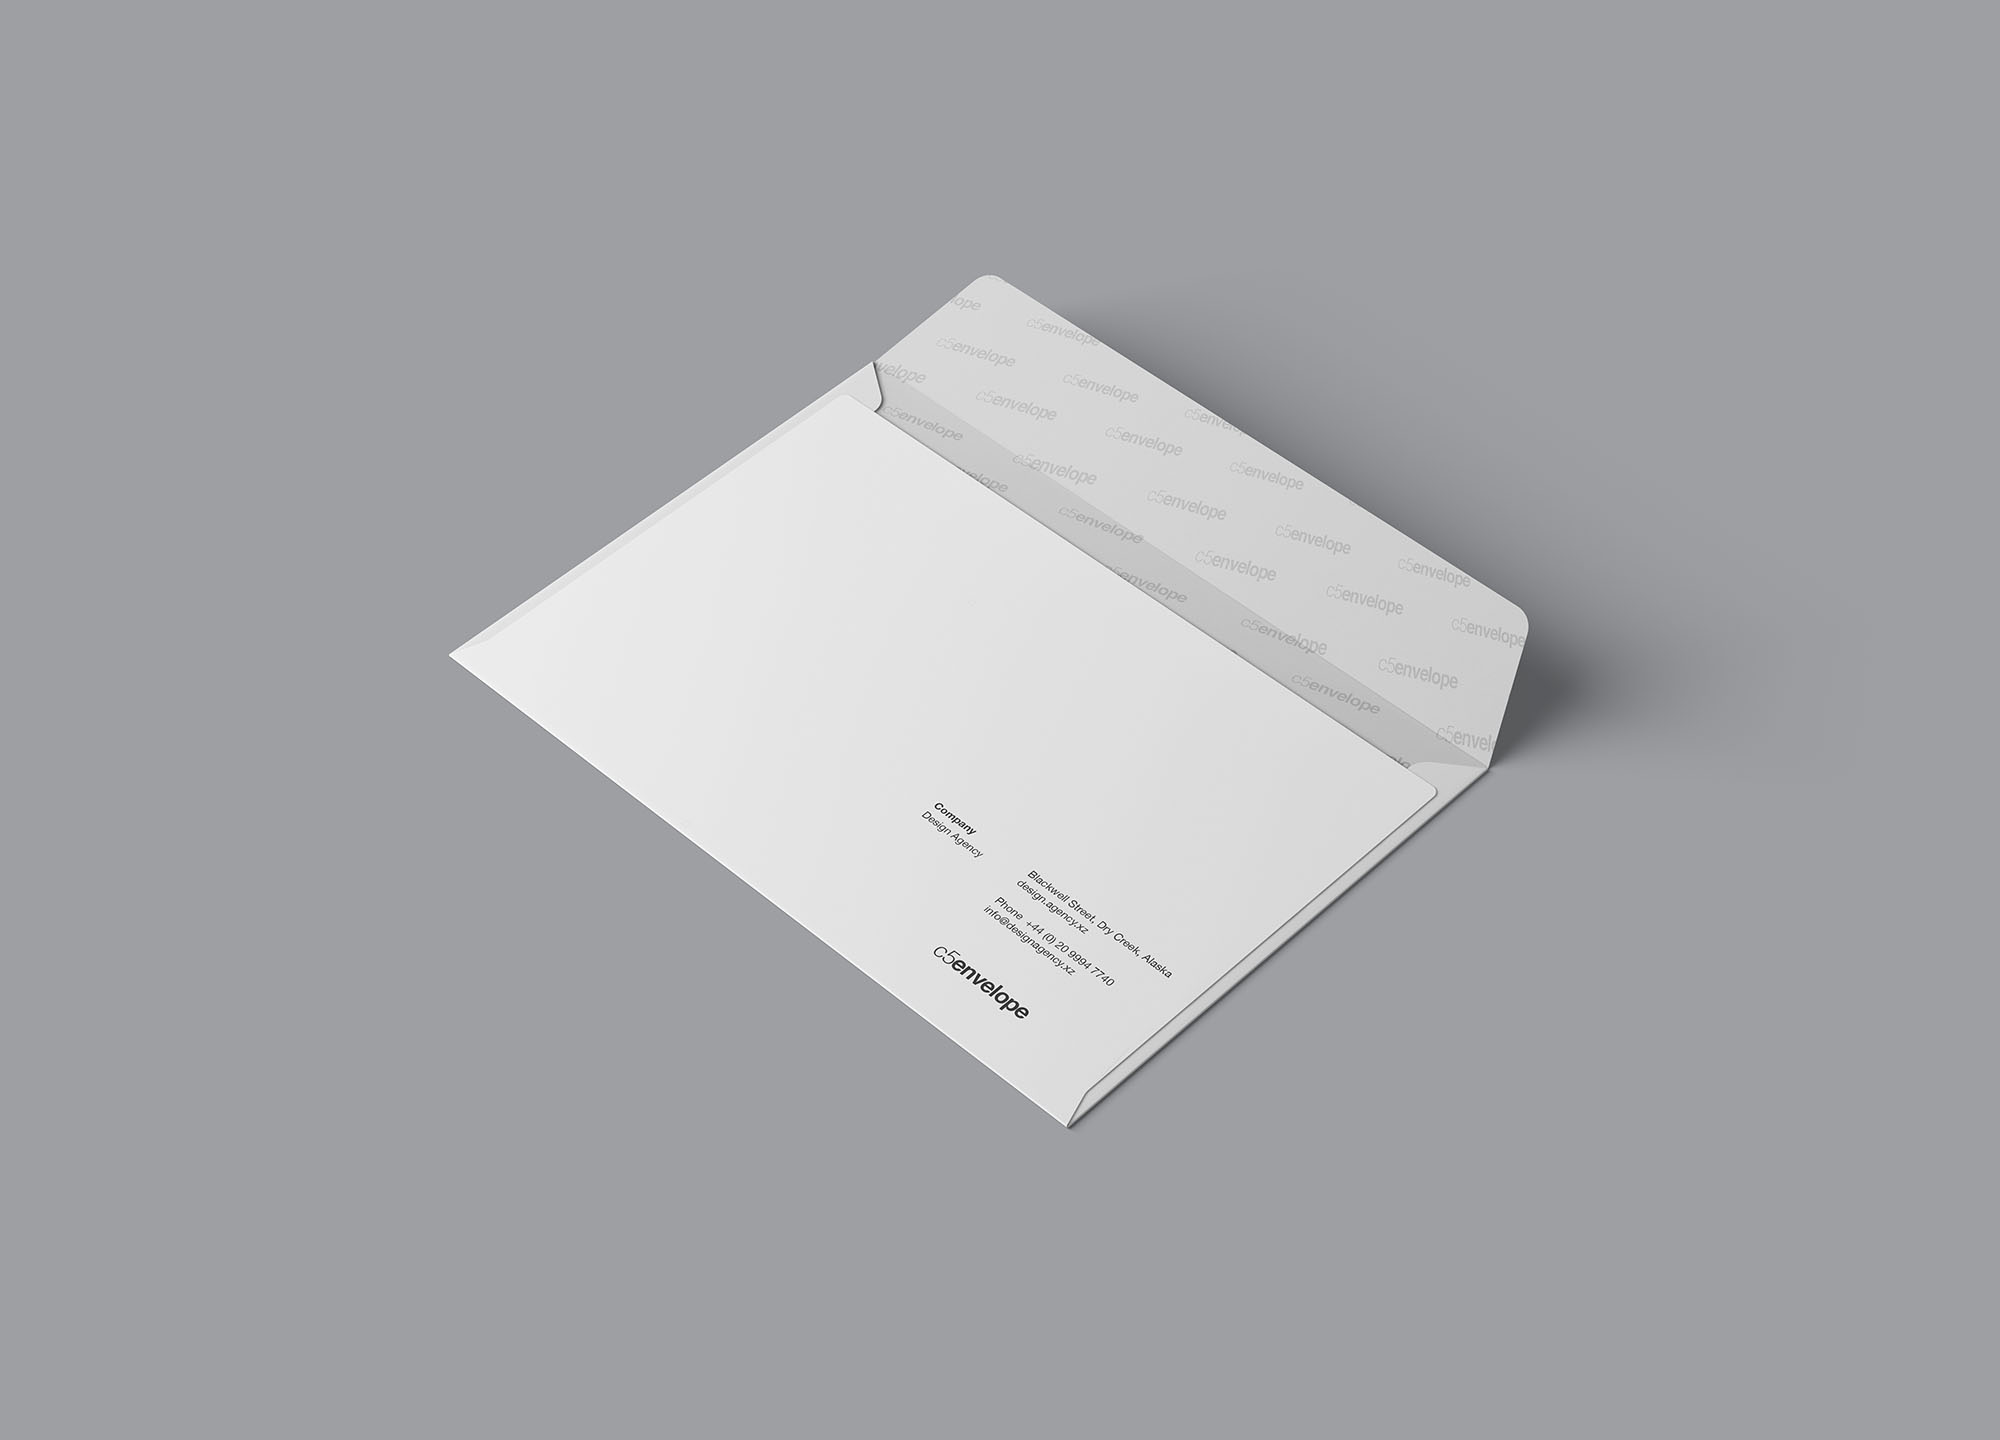 Opened C4 Envelope Mockup